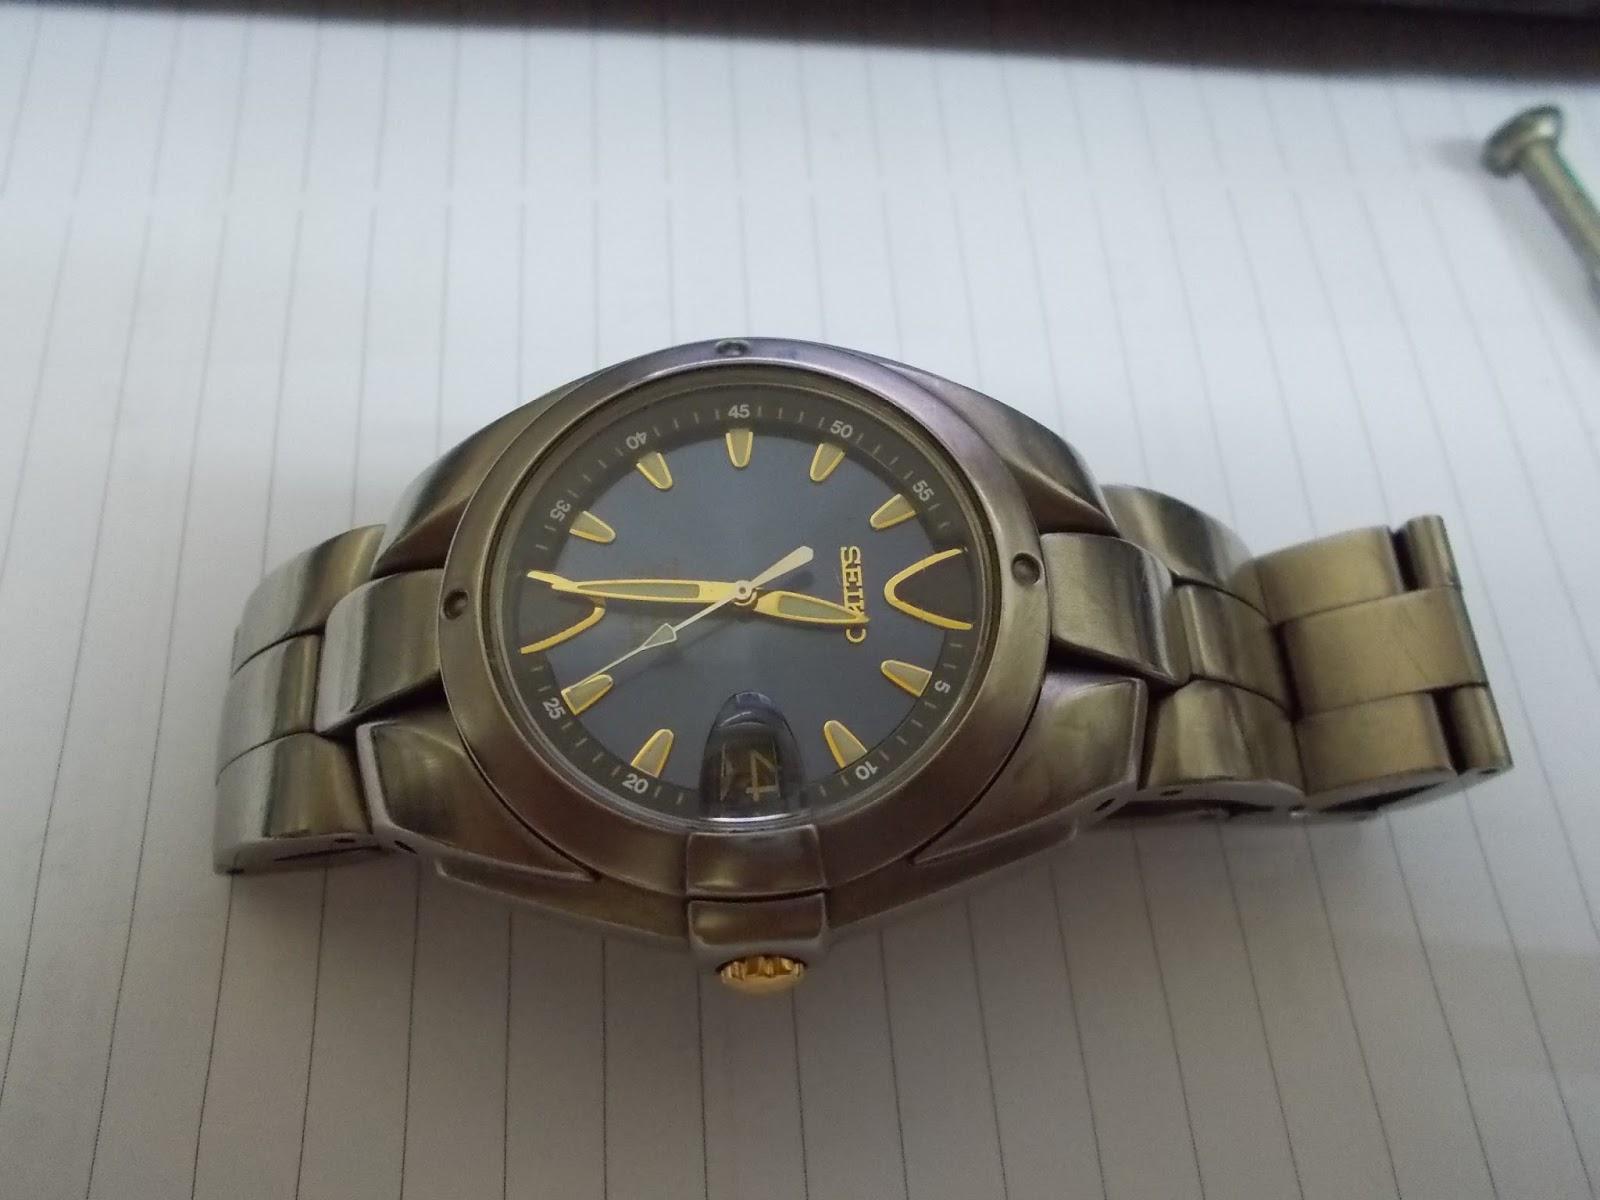 Seiko Perpetual Calendar Vintage : Vintage watches seiko titanium perpetual calendar rm